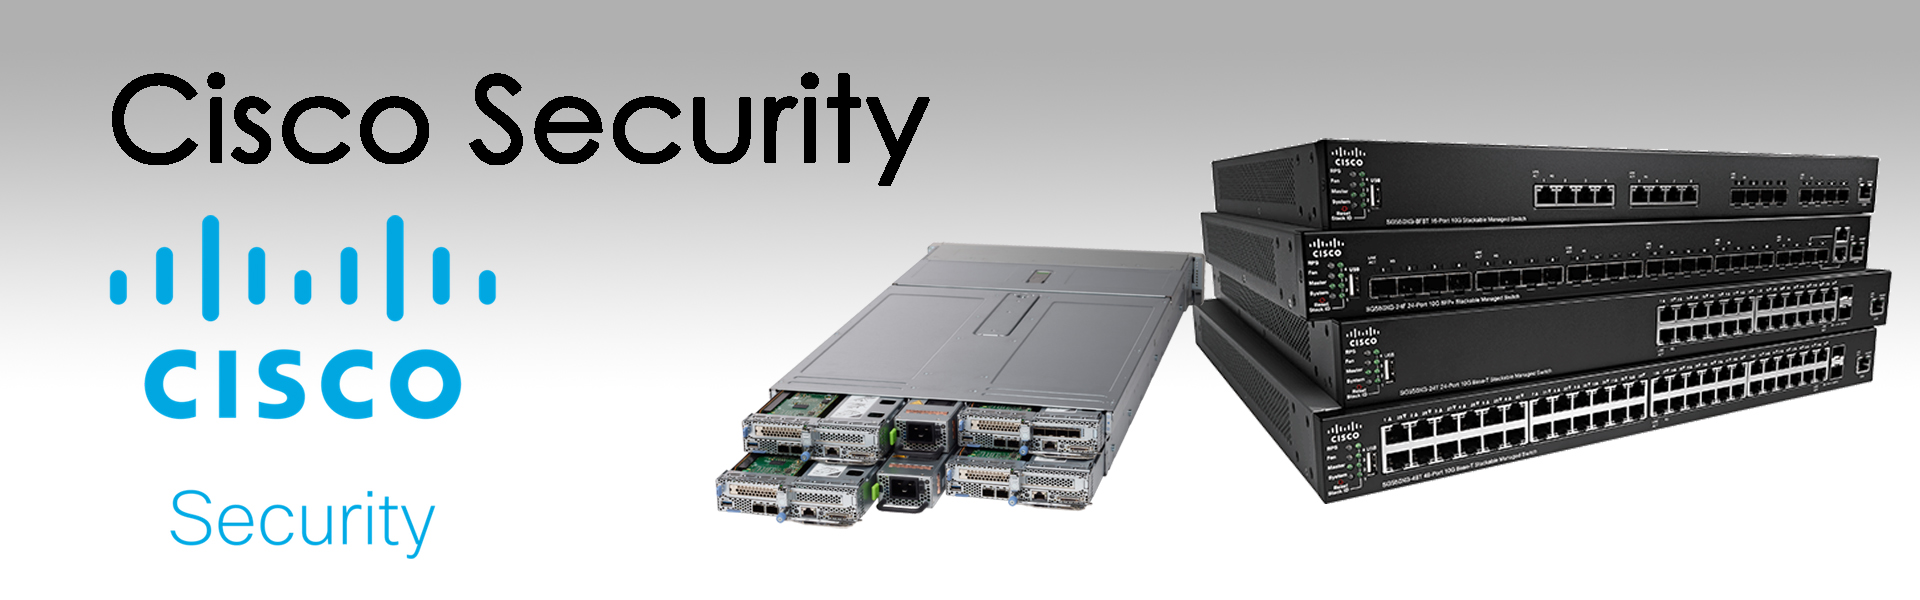 Cisco Security Banner